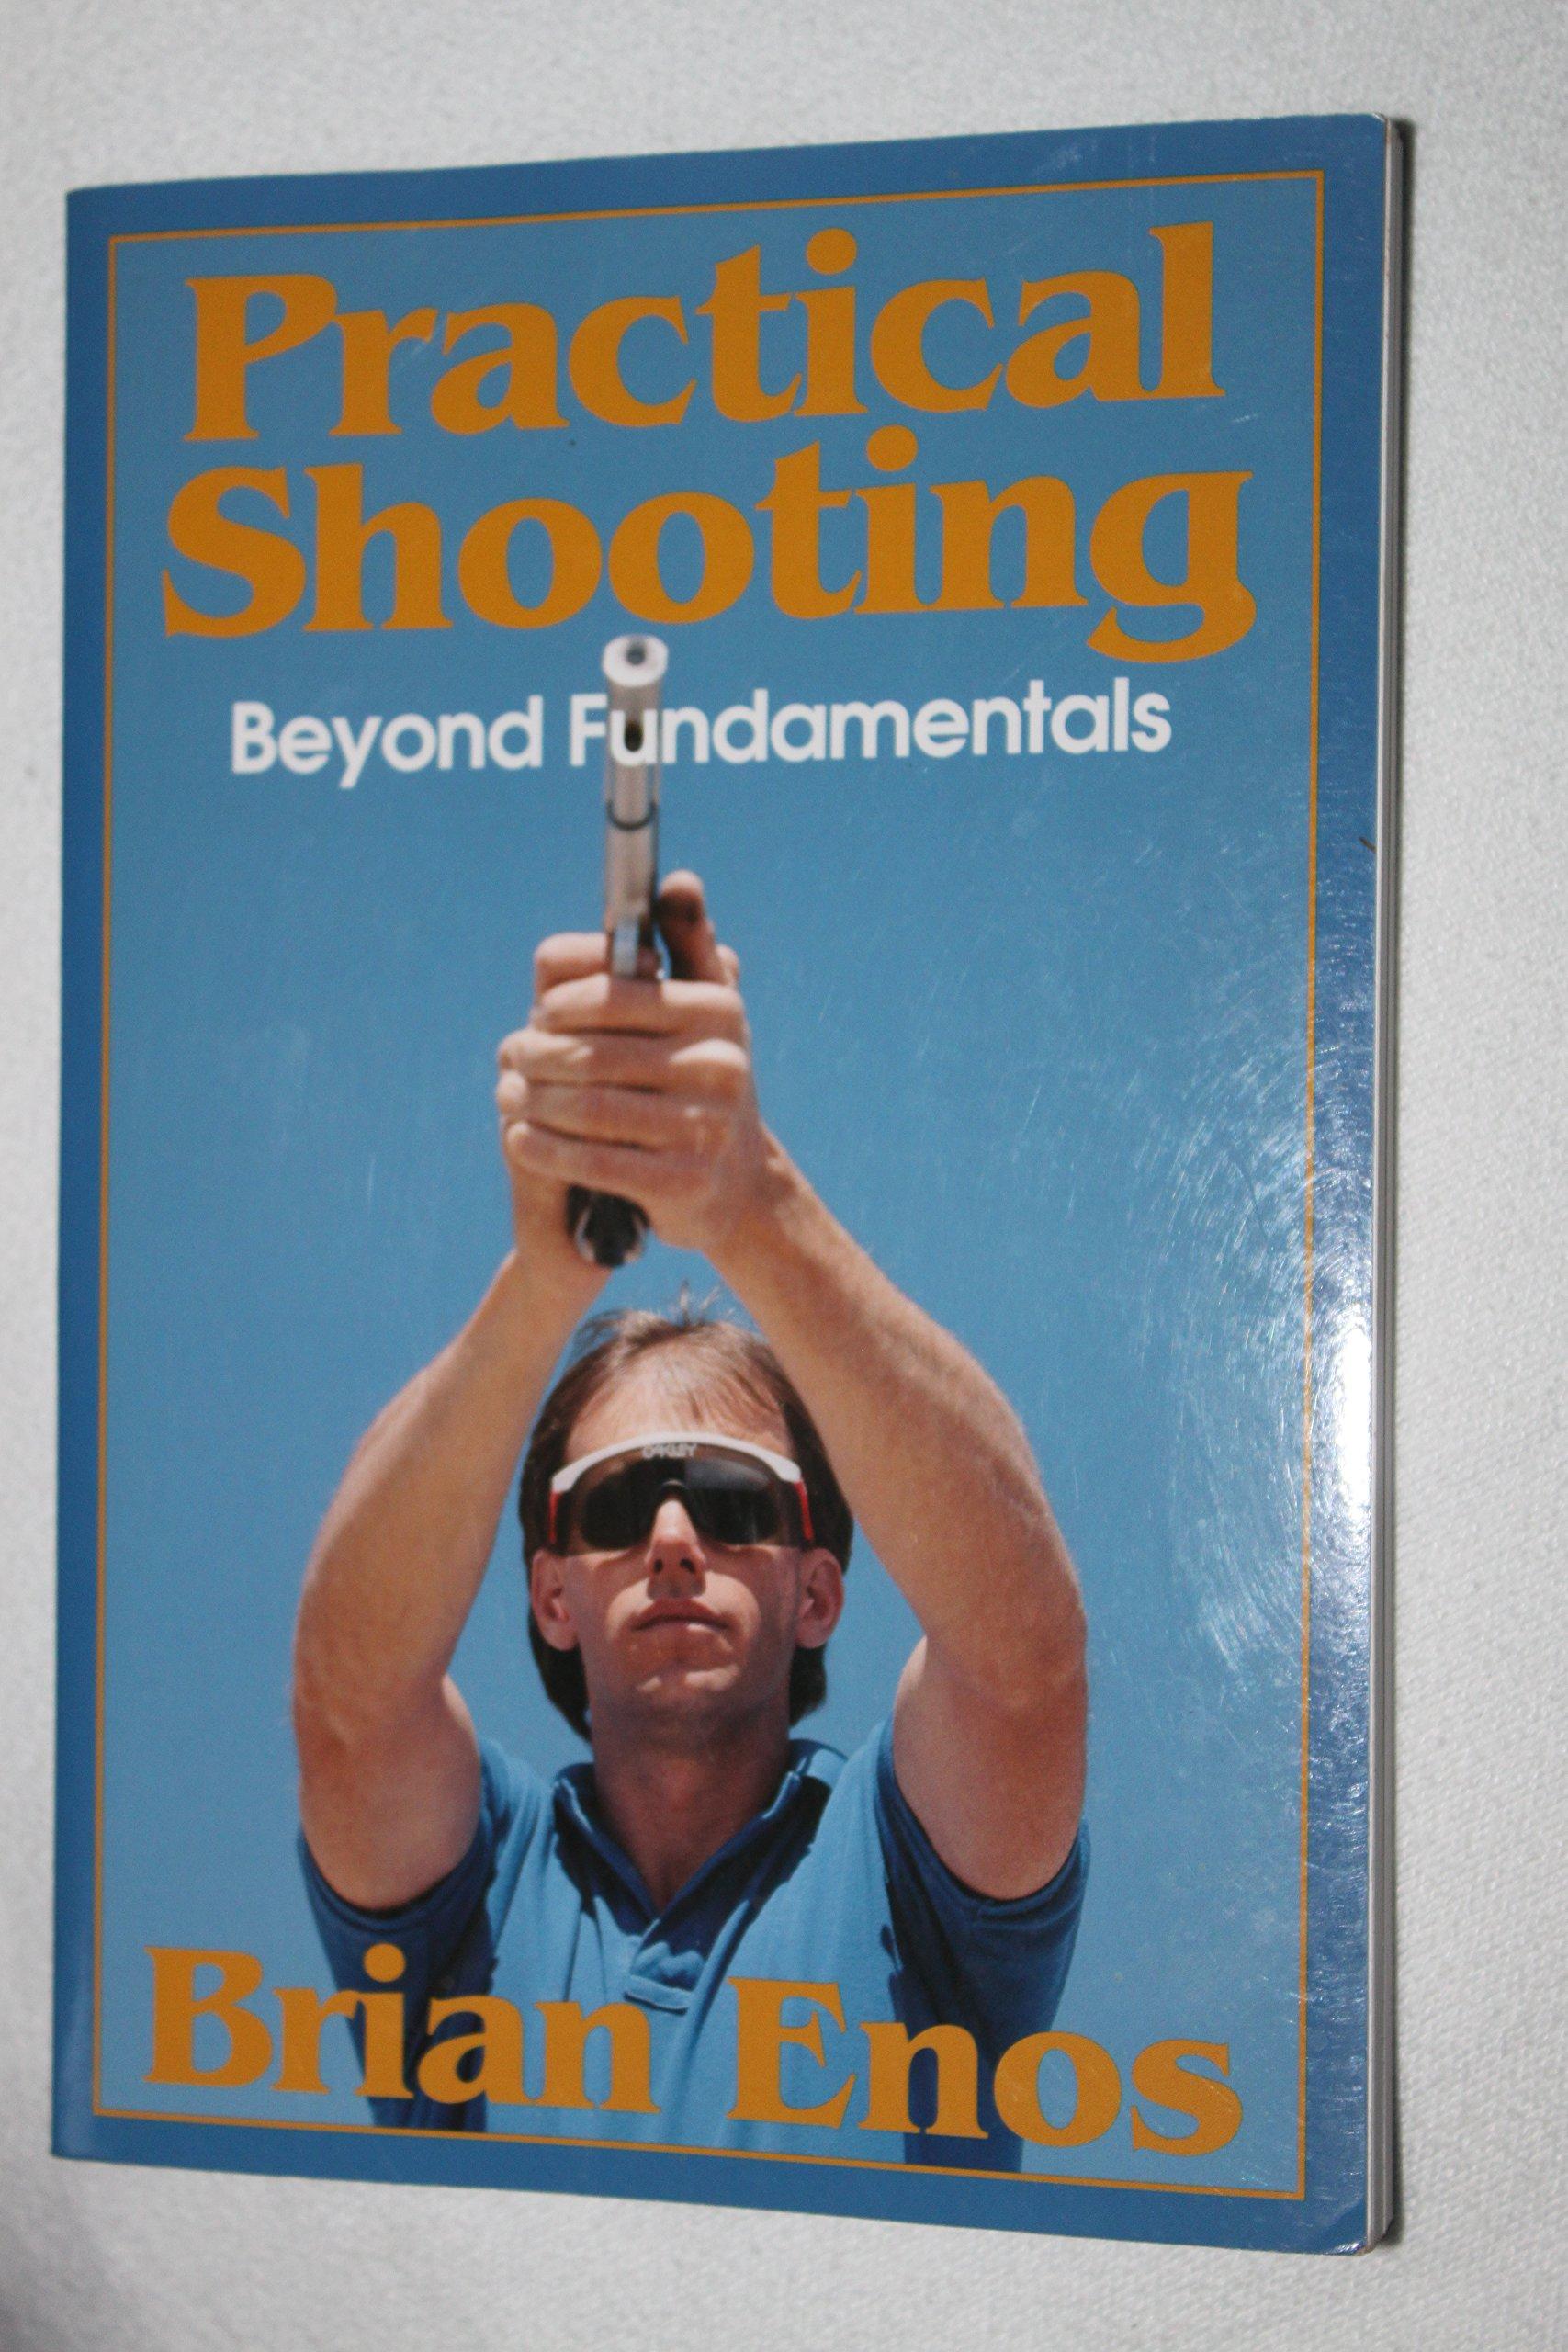 Practice Shooting: Beyond Fundamentals